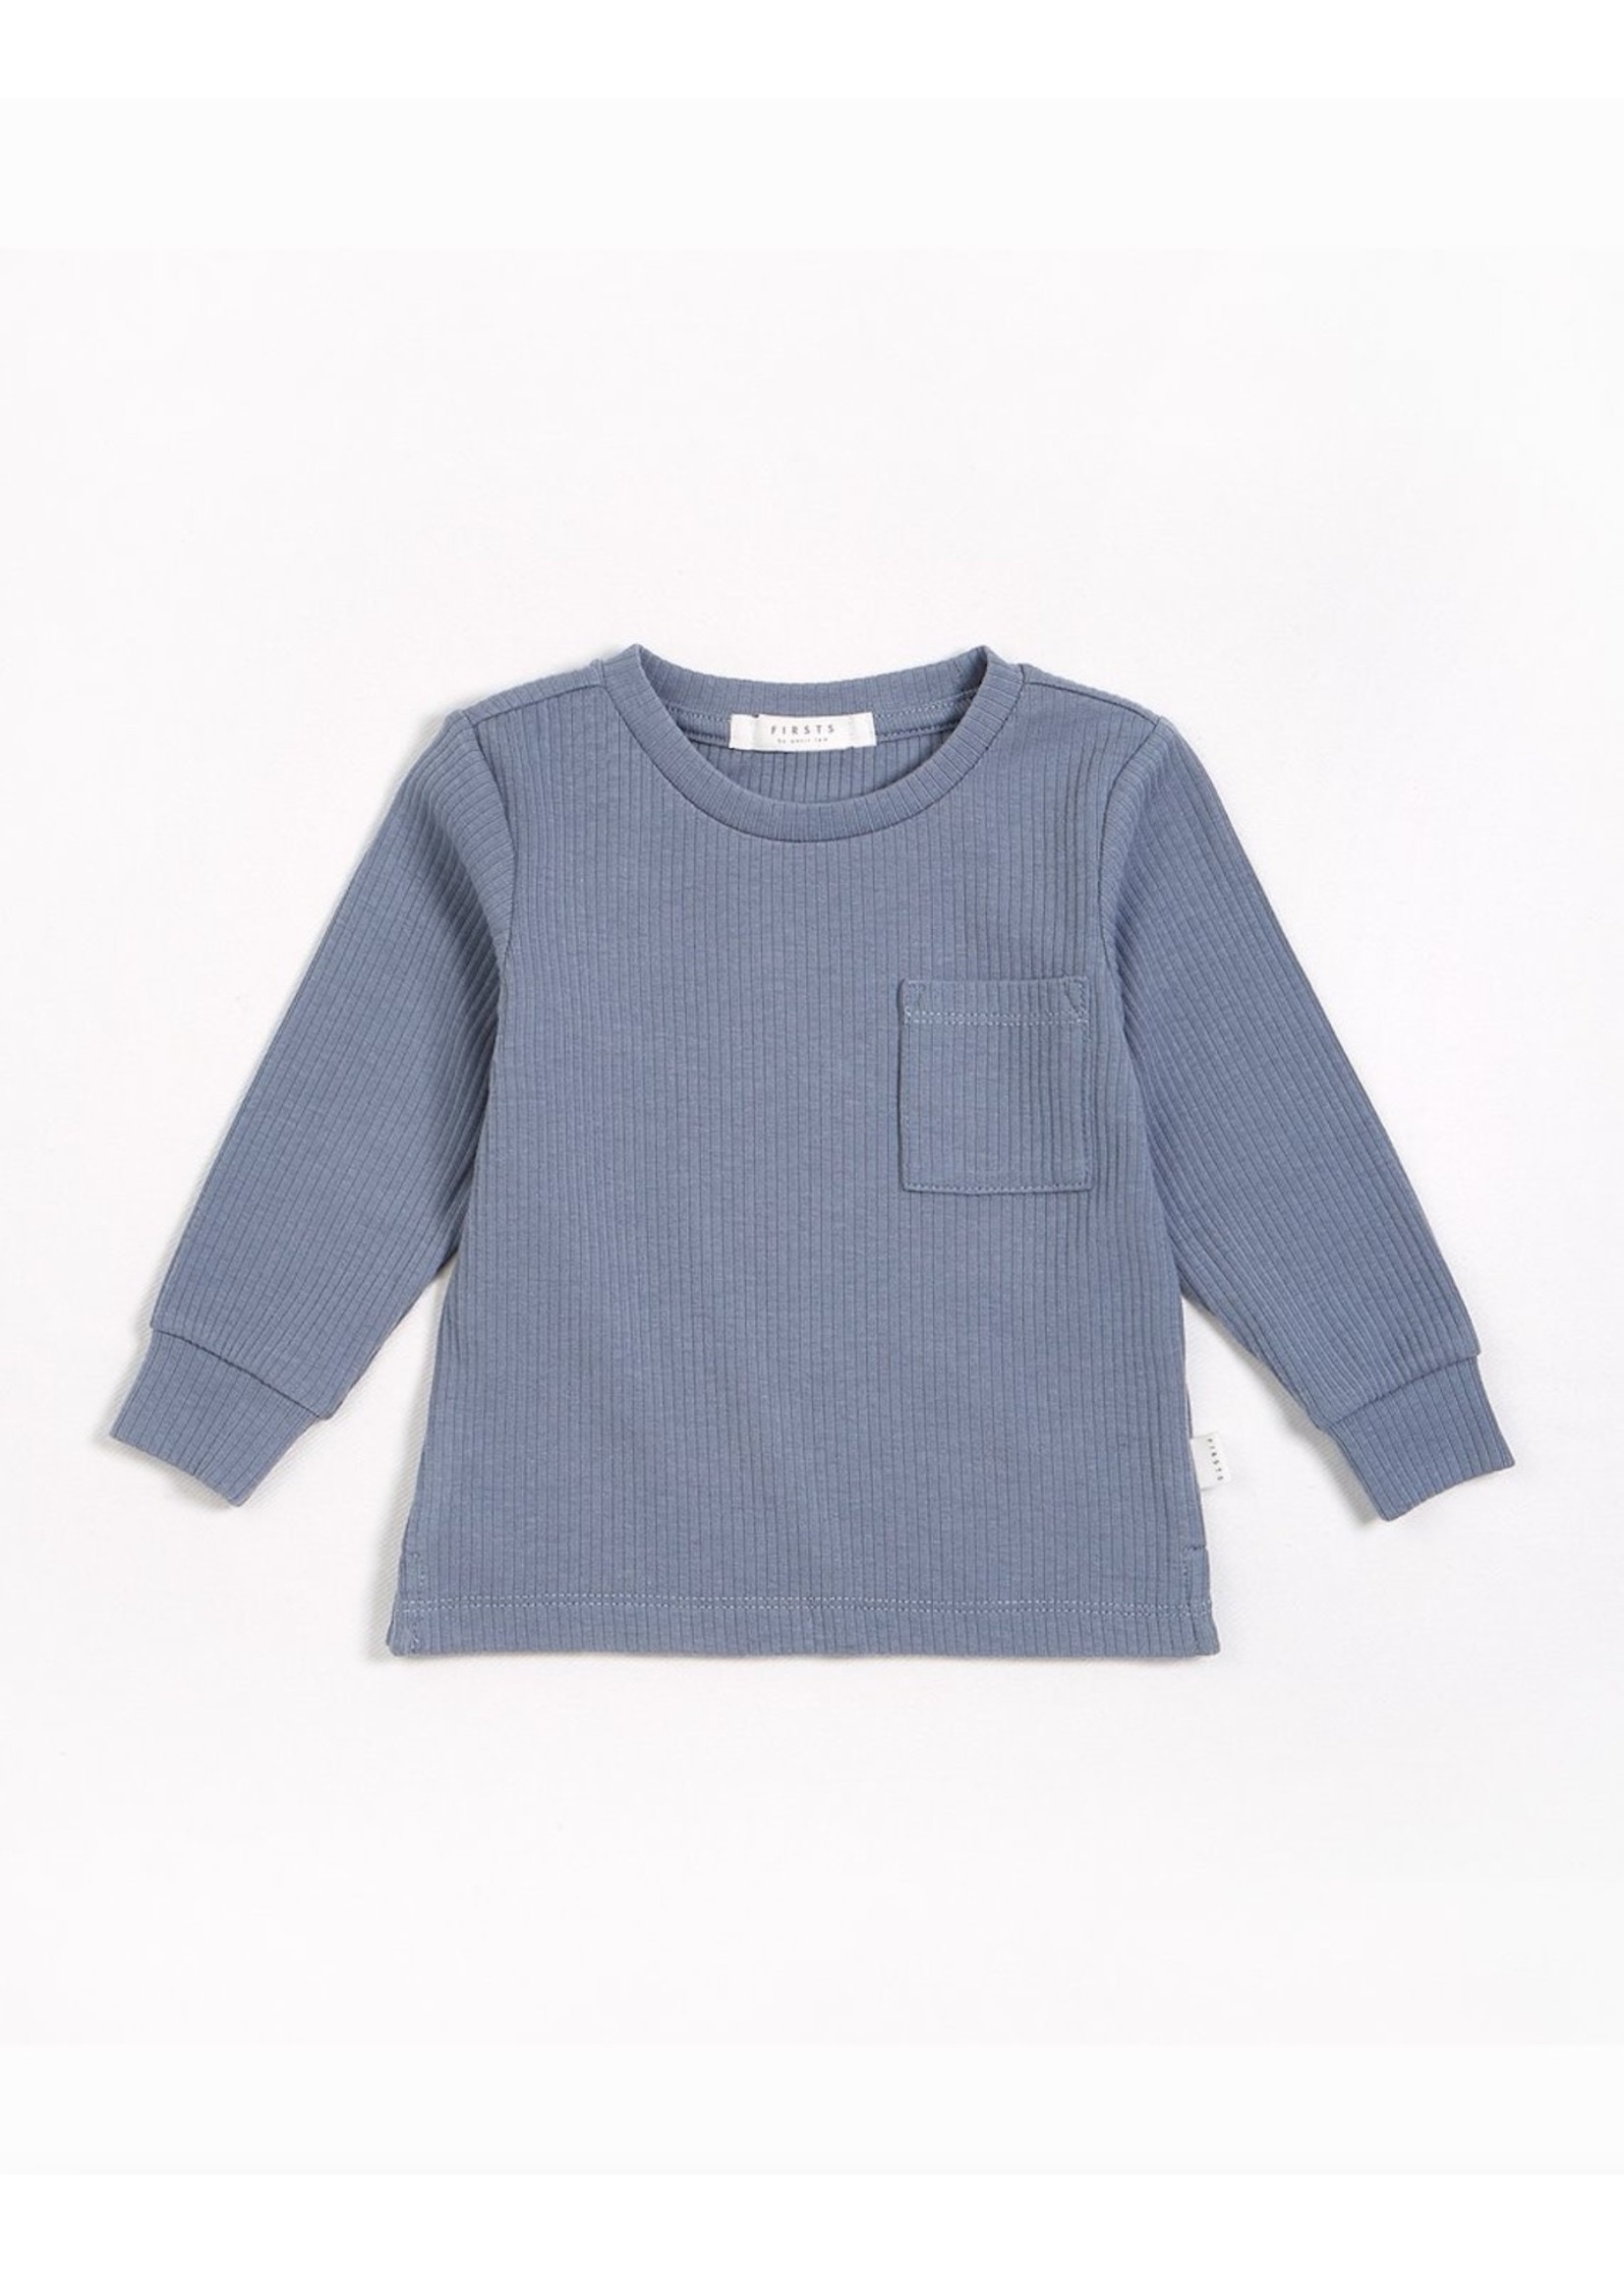 Petit Lem Petit Lem, Blue Dusk Modal Rib Long-Sleeve T-Shirt (NB-24M)